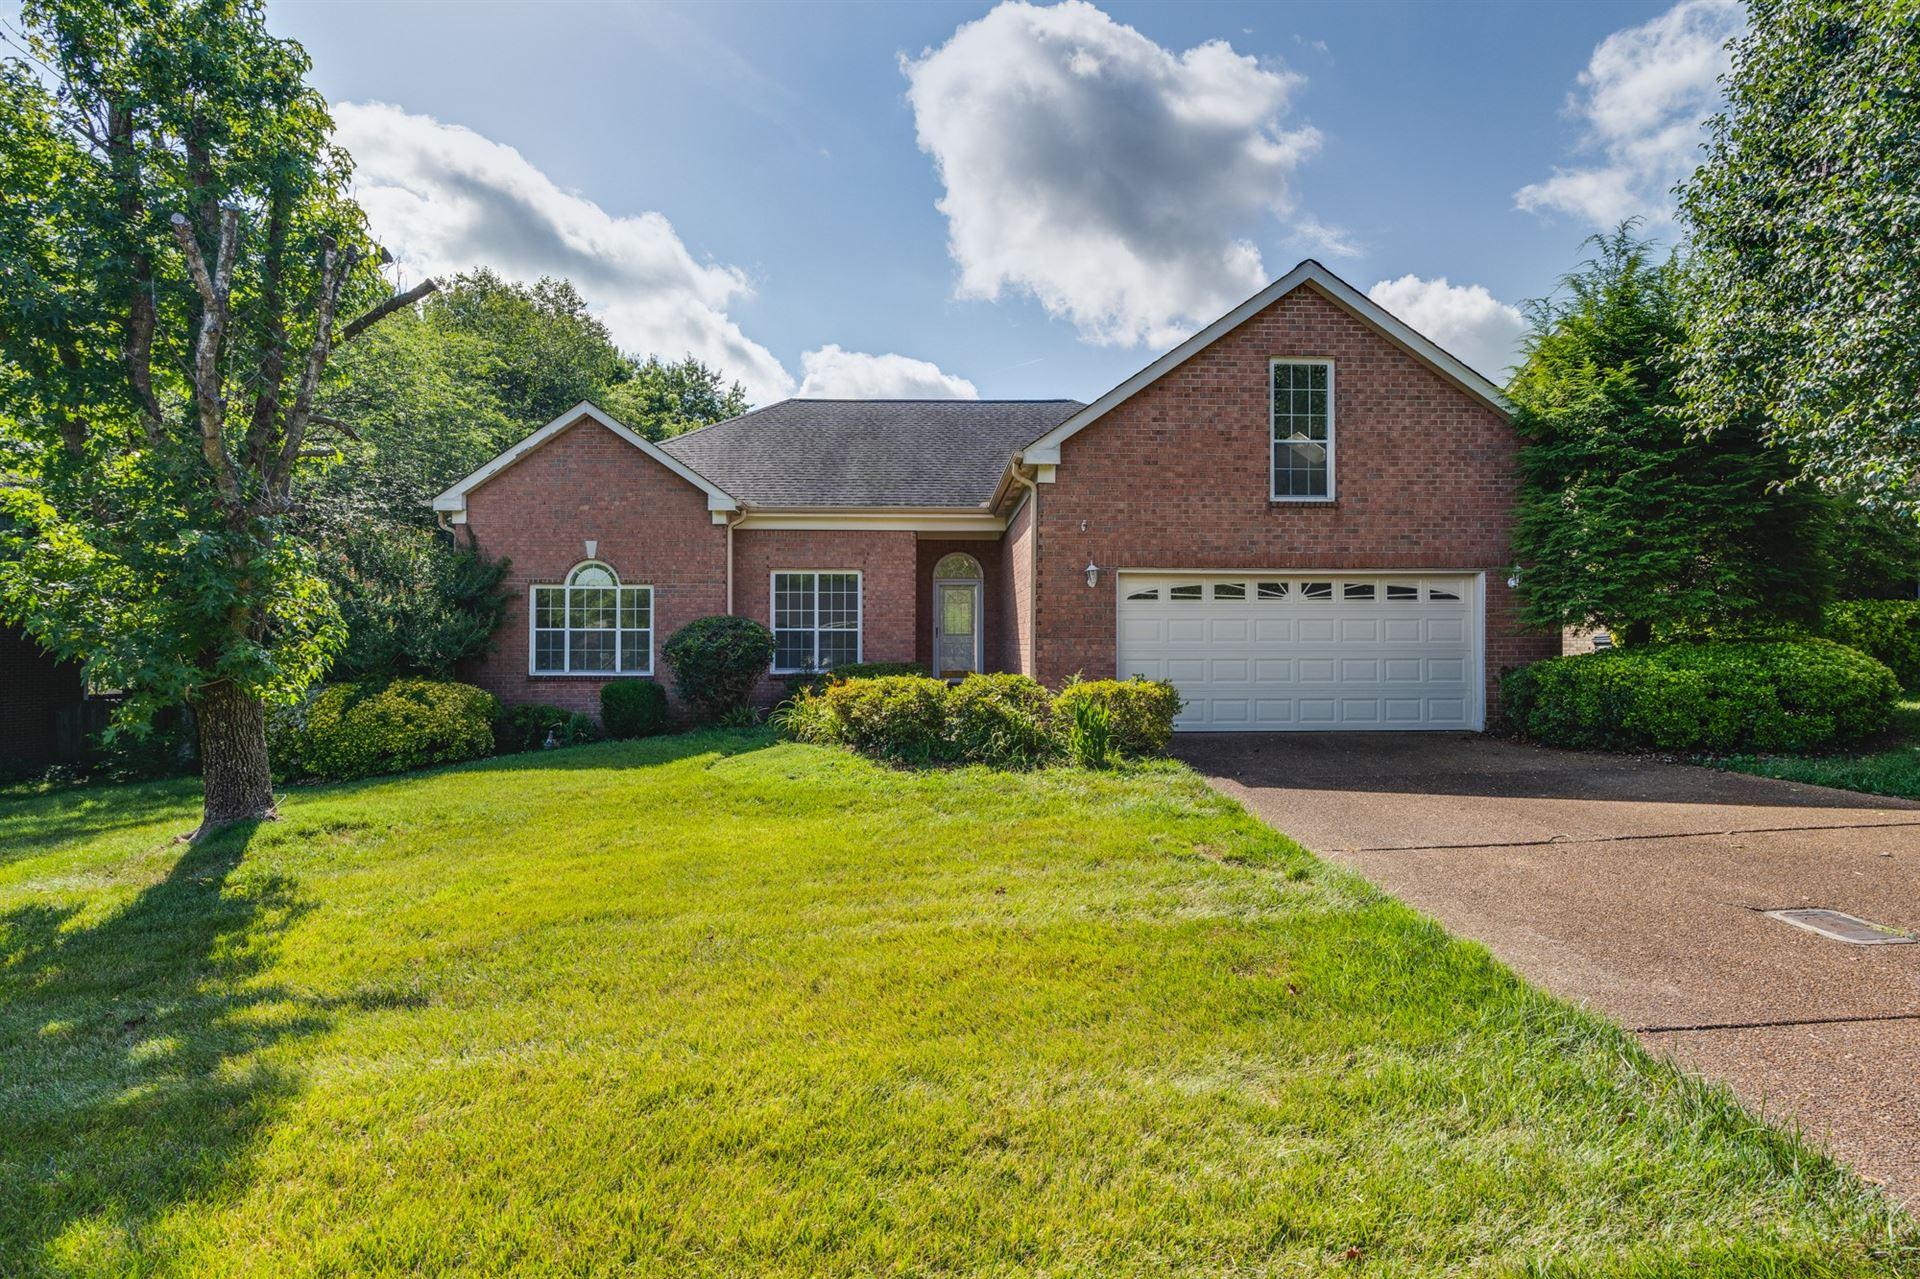 7936 Amber Hills Ln, Nashville, TN 37221 - MLS#: 2274058